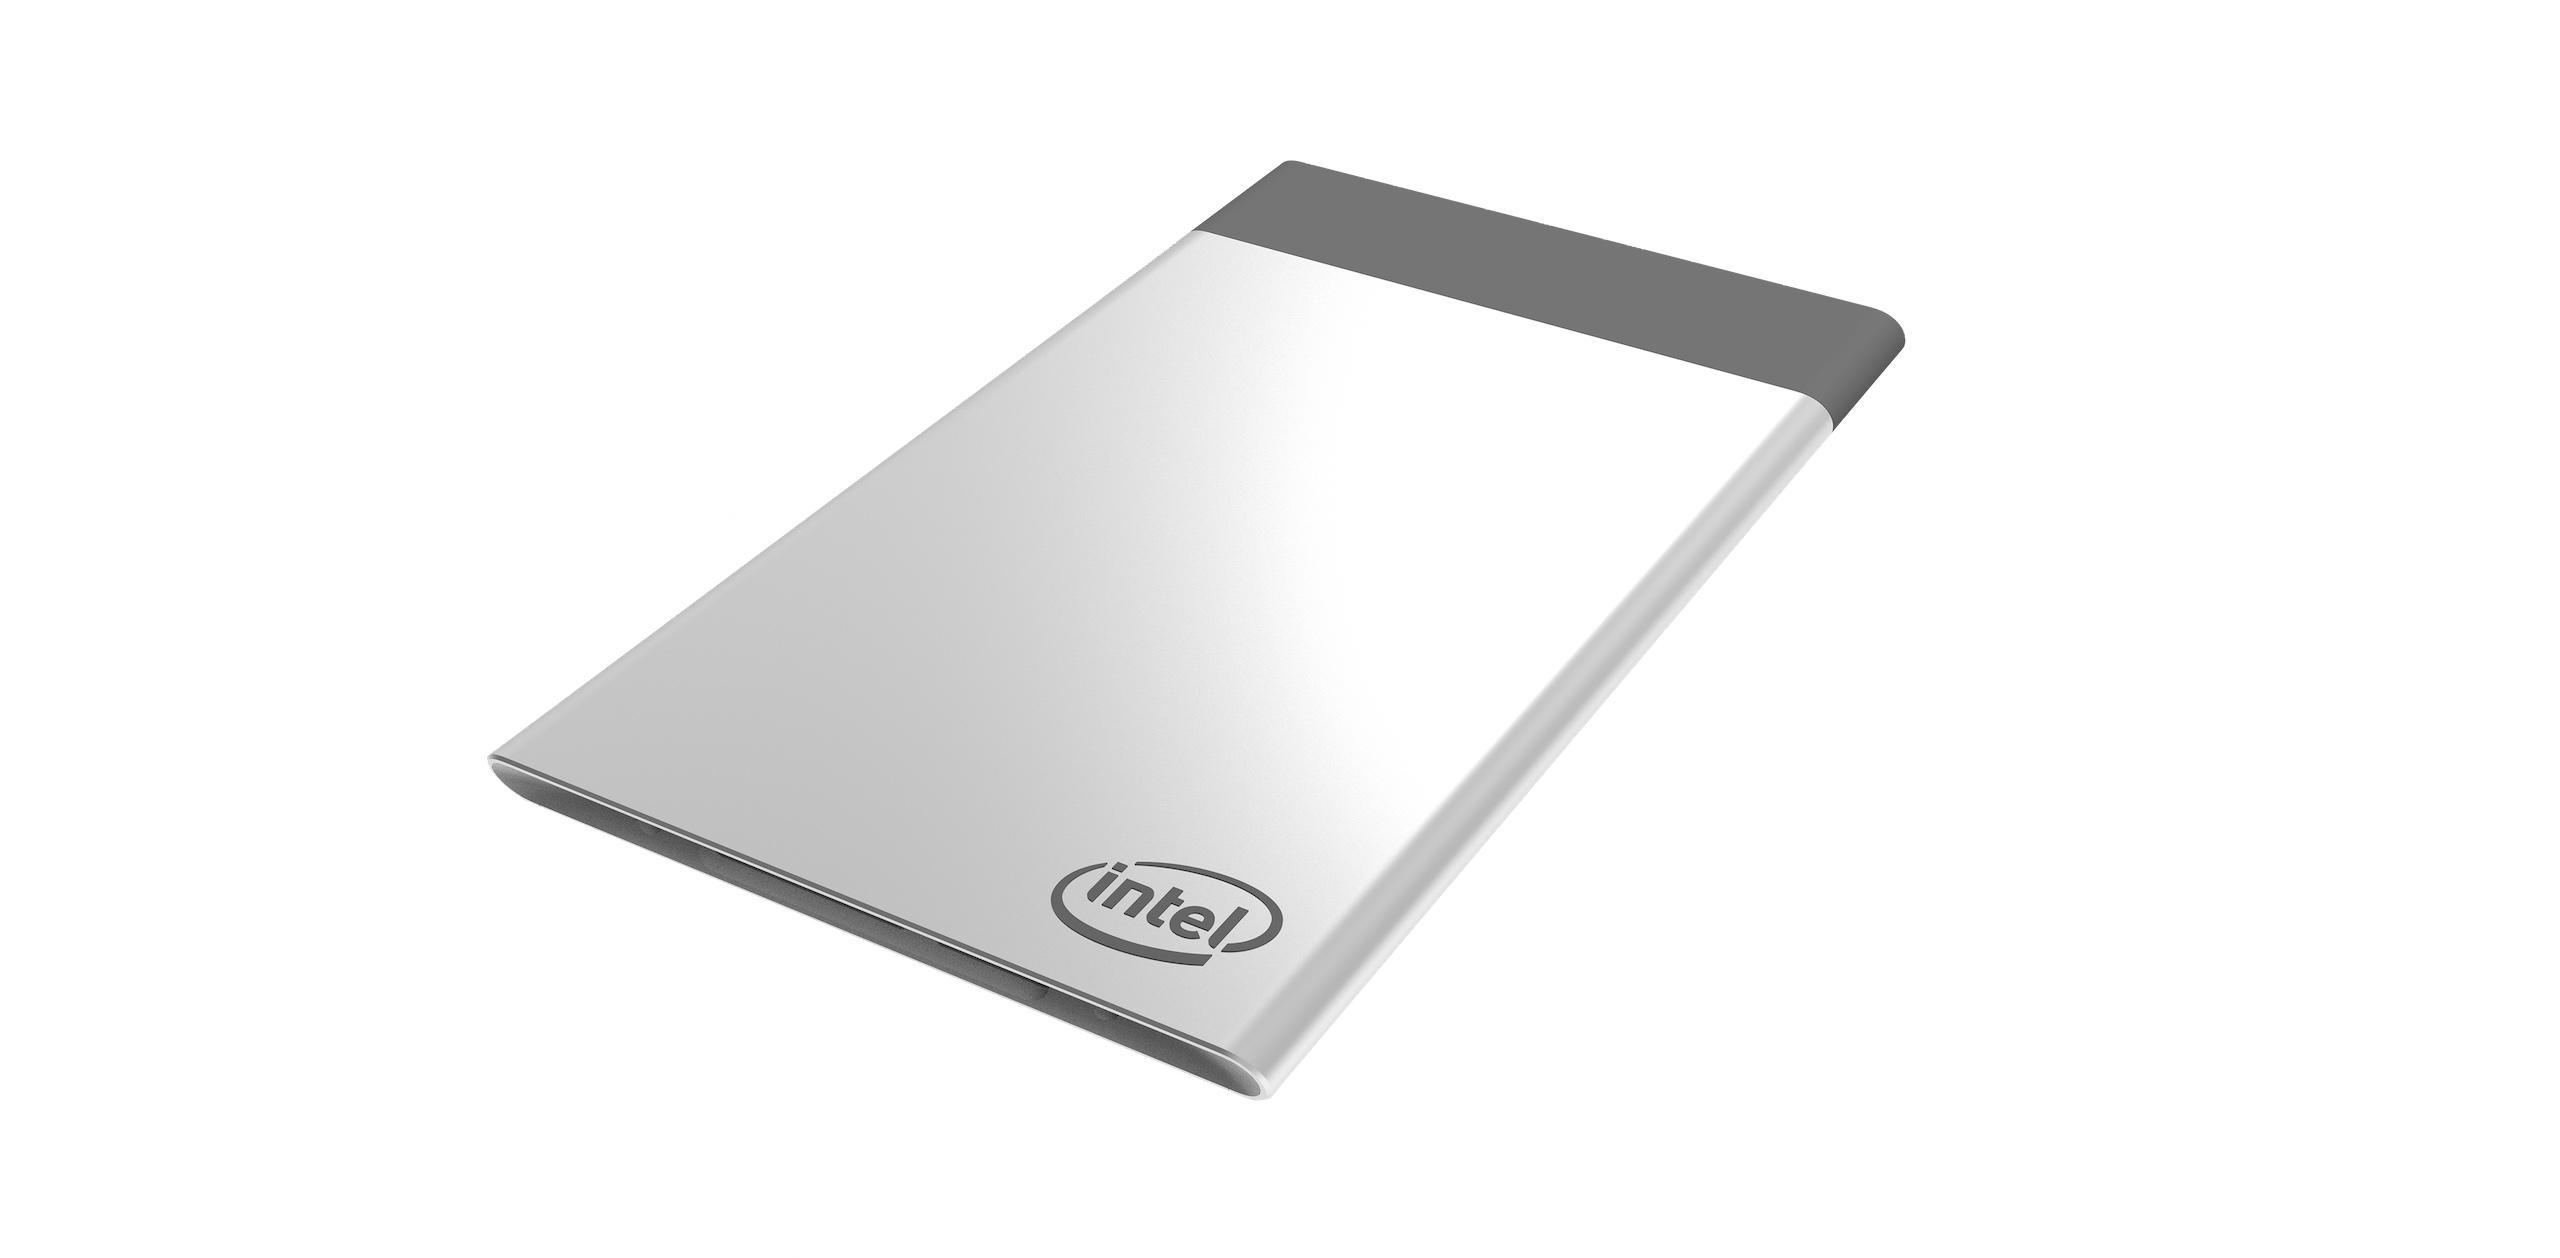 Intel Compute Card BLKCD1P64GK, N4200, 4GB RAM, 64GB eMMC, No OS